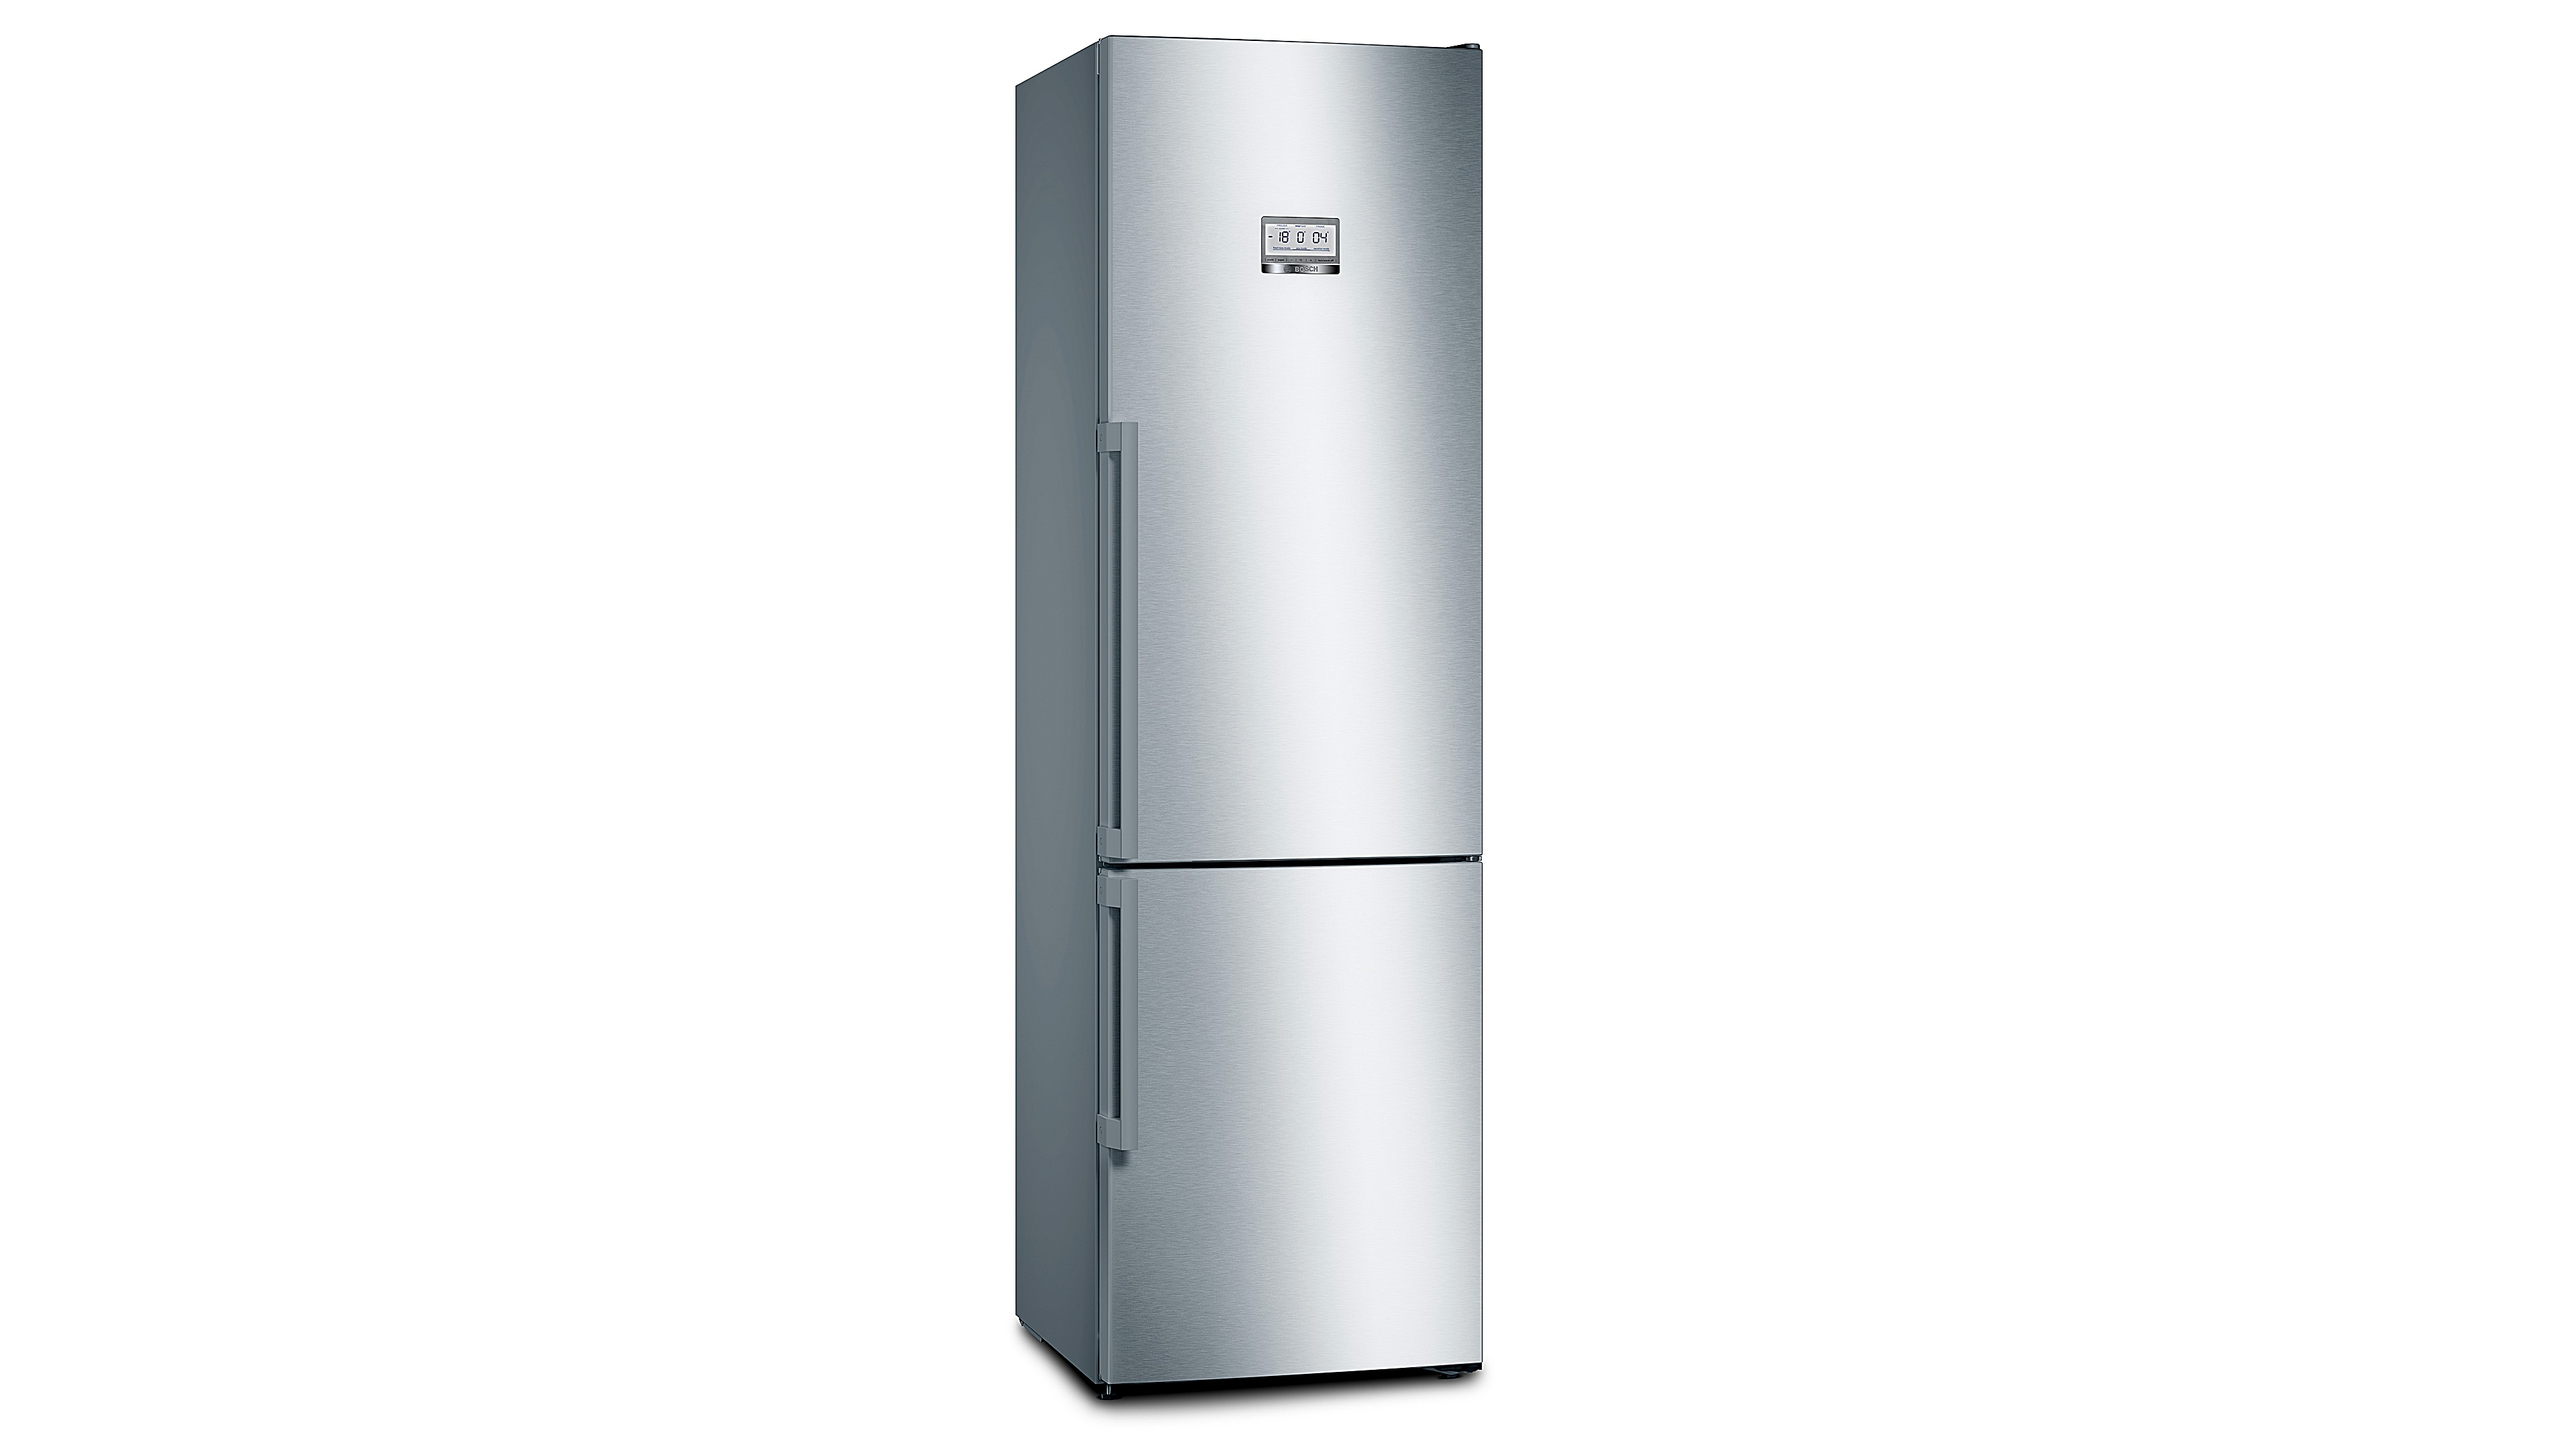 Bosch KGF39PI45 koelkast met vriesvak